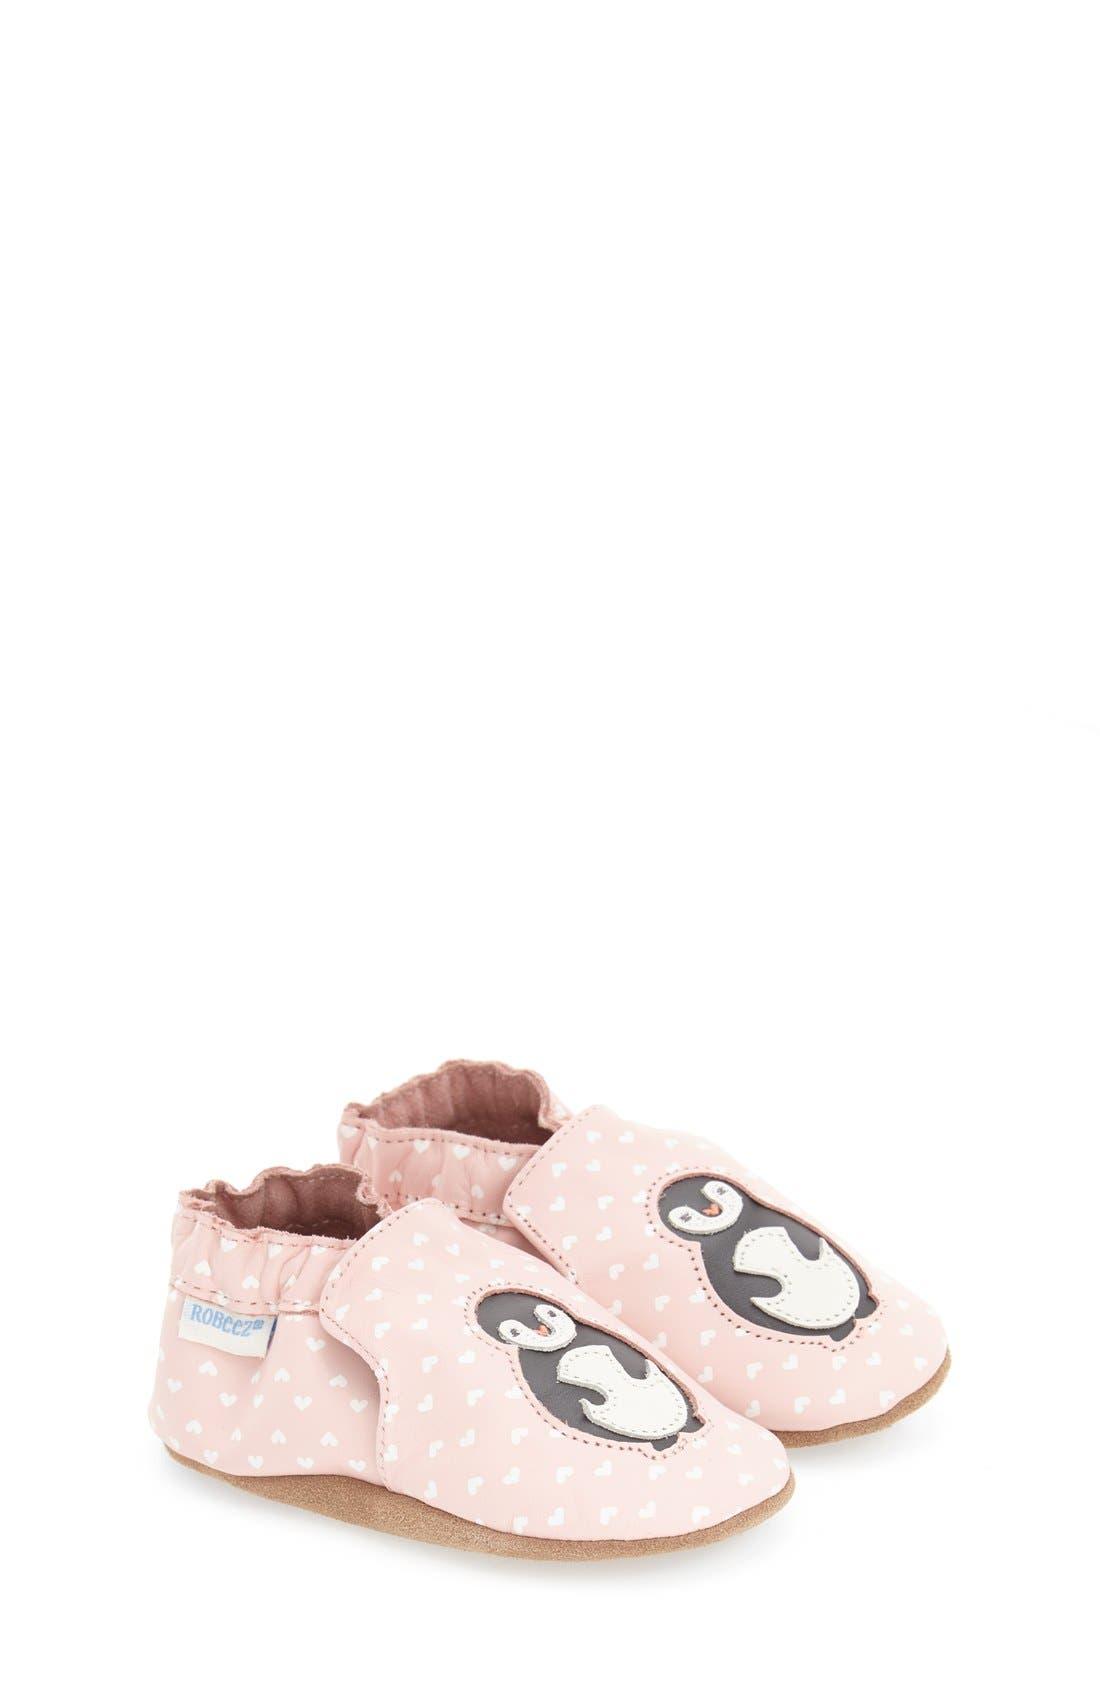 ROBEEZ® 'Piper Penguin' Crib Shoe